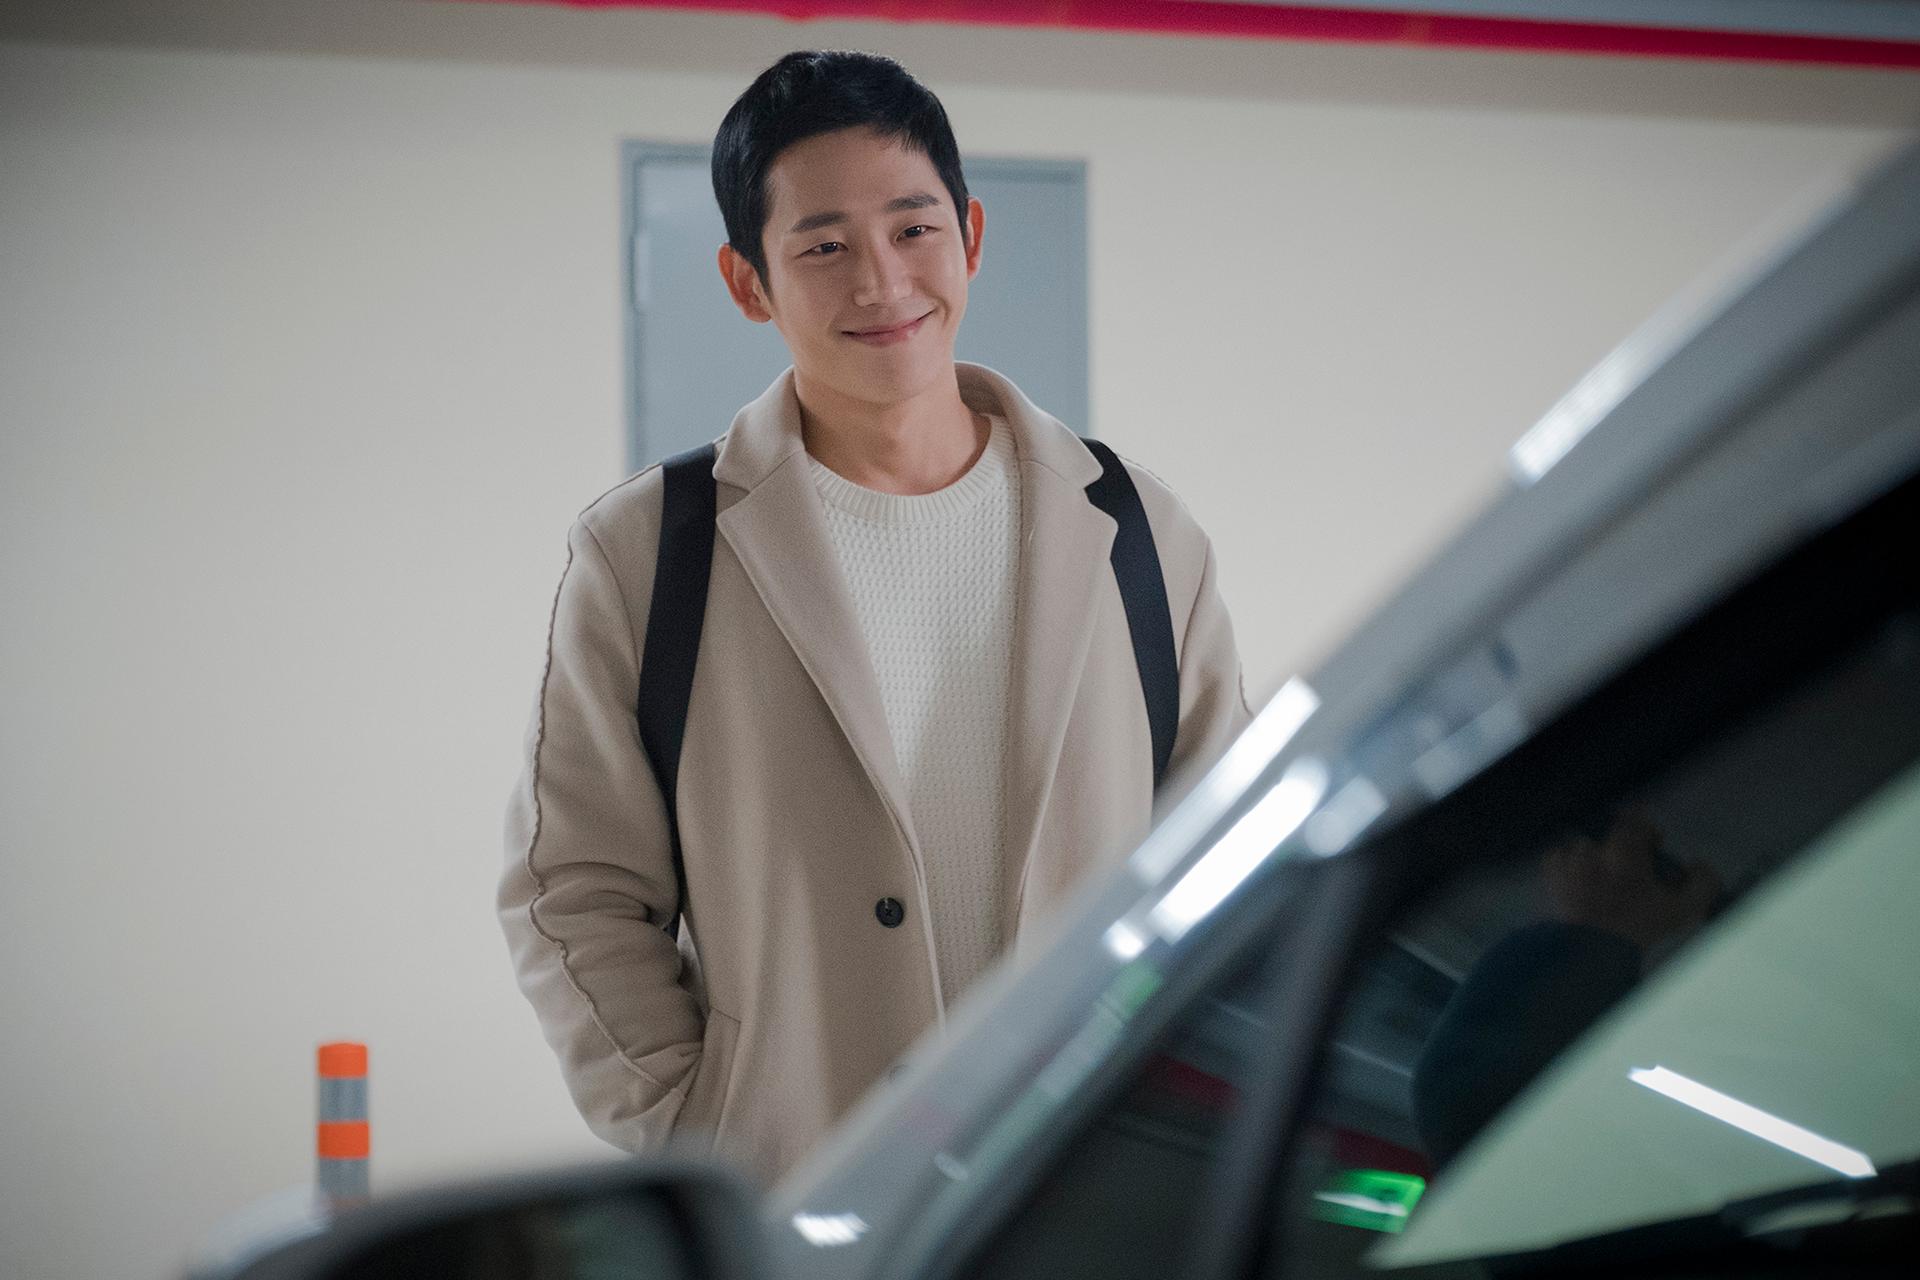 South Korean actress Choi Ji-woo complains as husband's personal